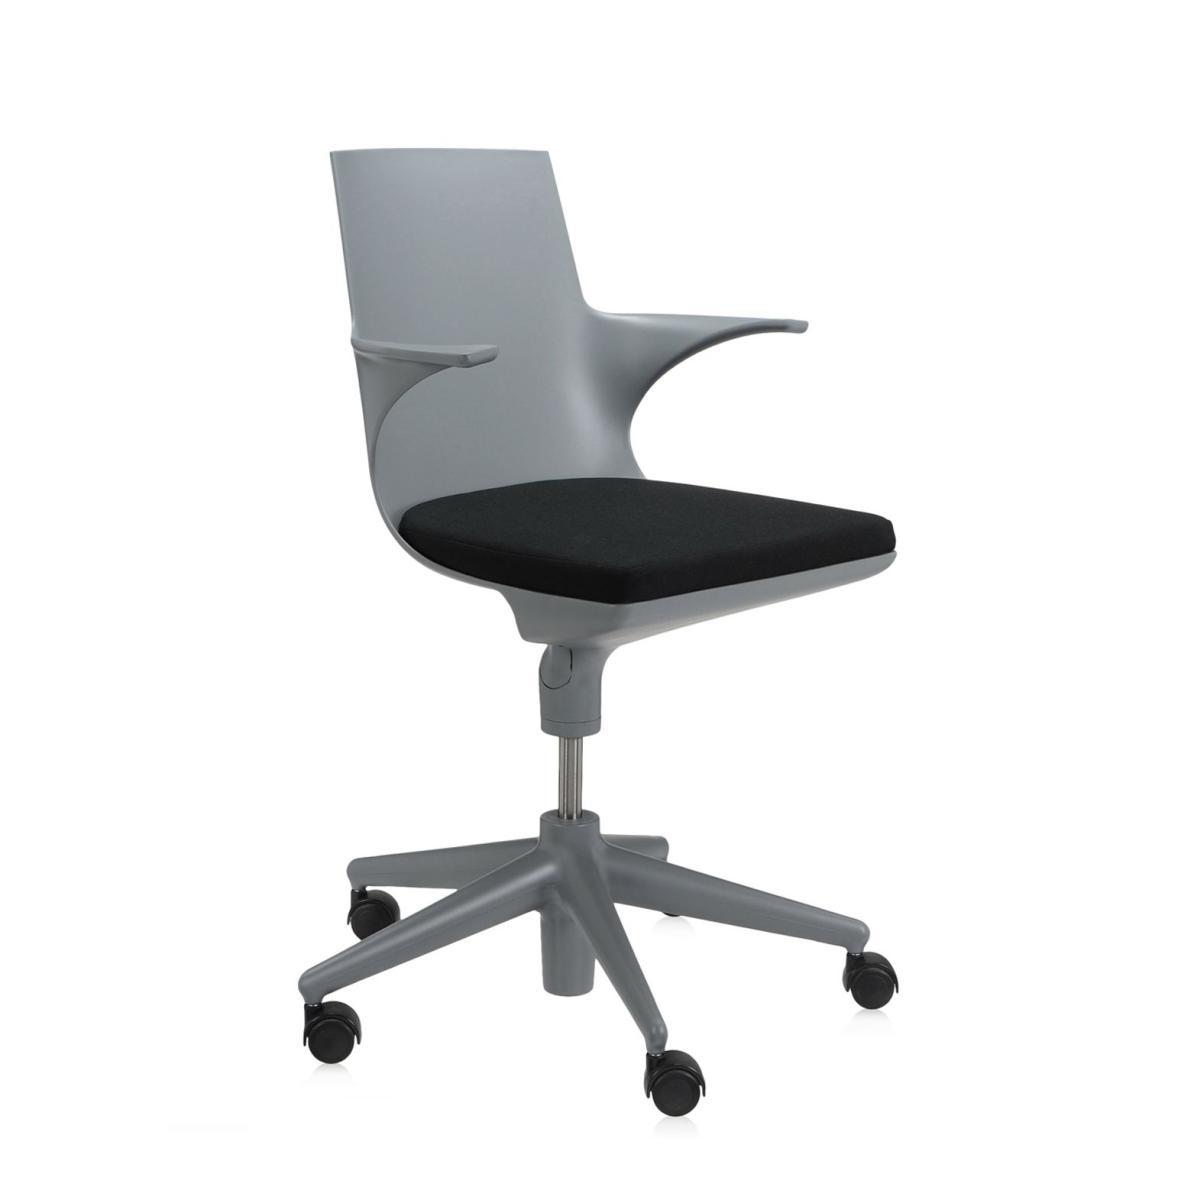 Spoon Chair Drehstuhl grau